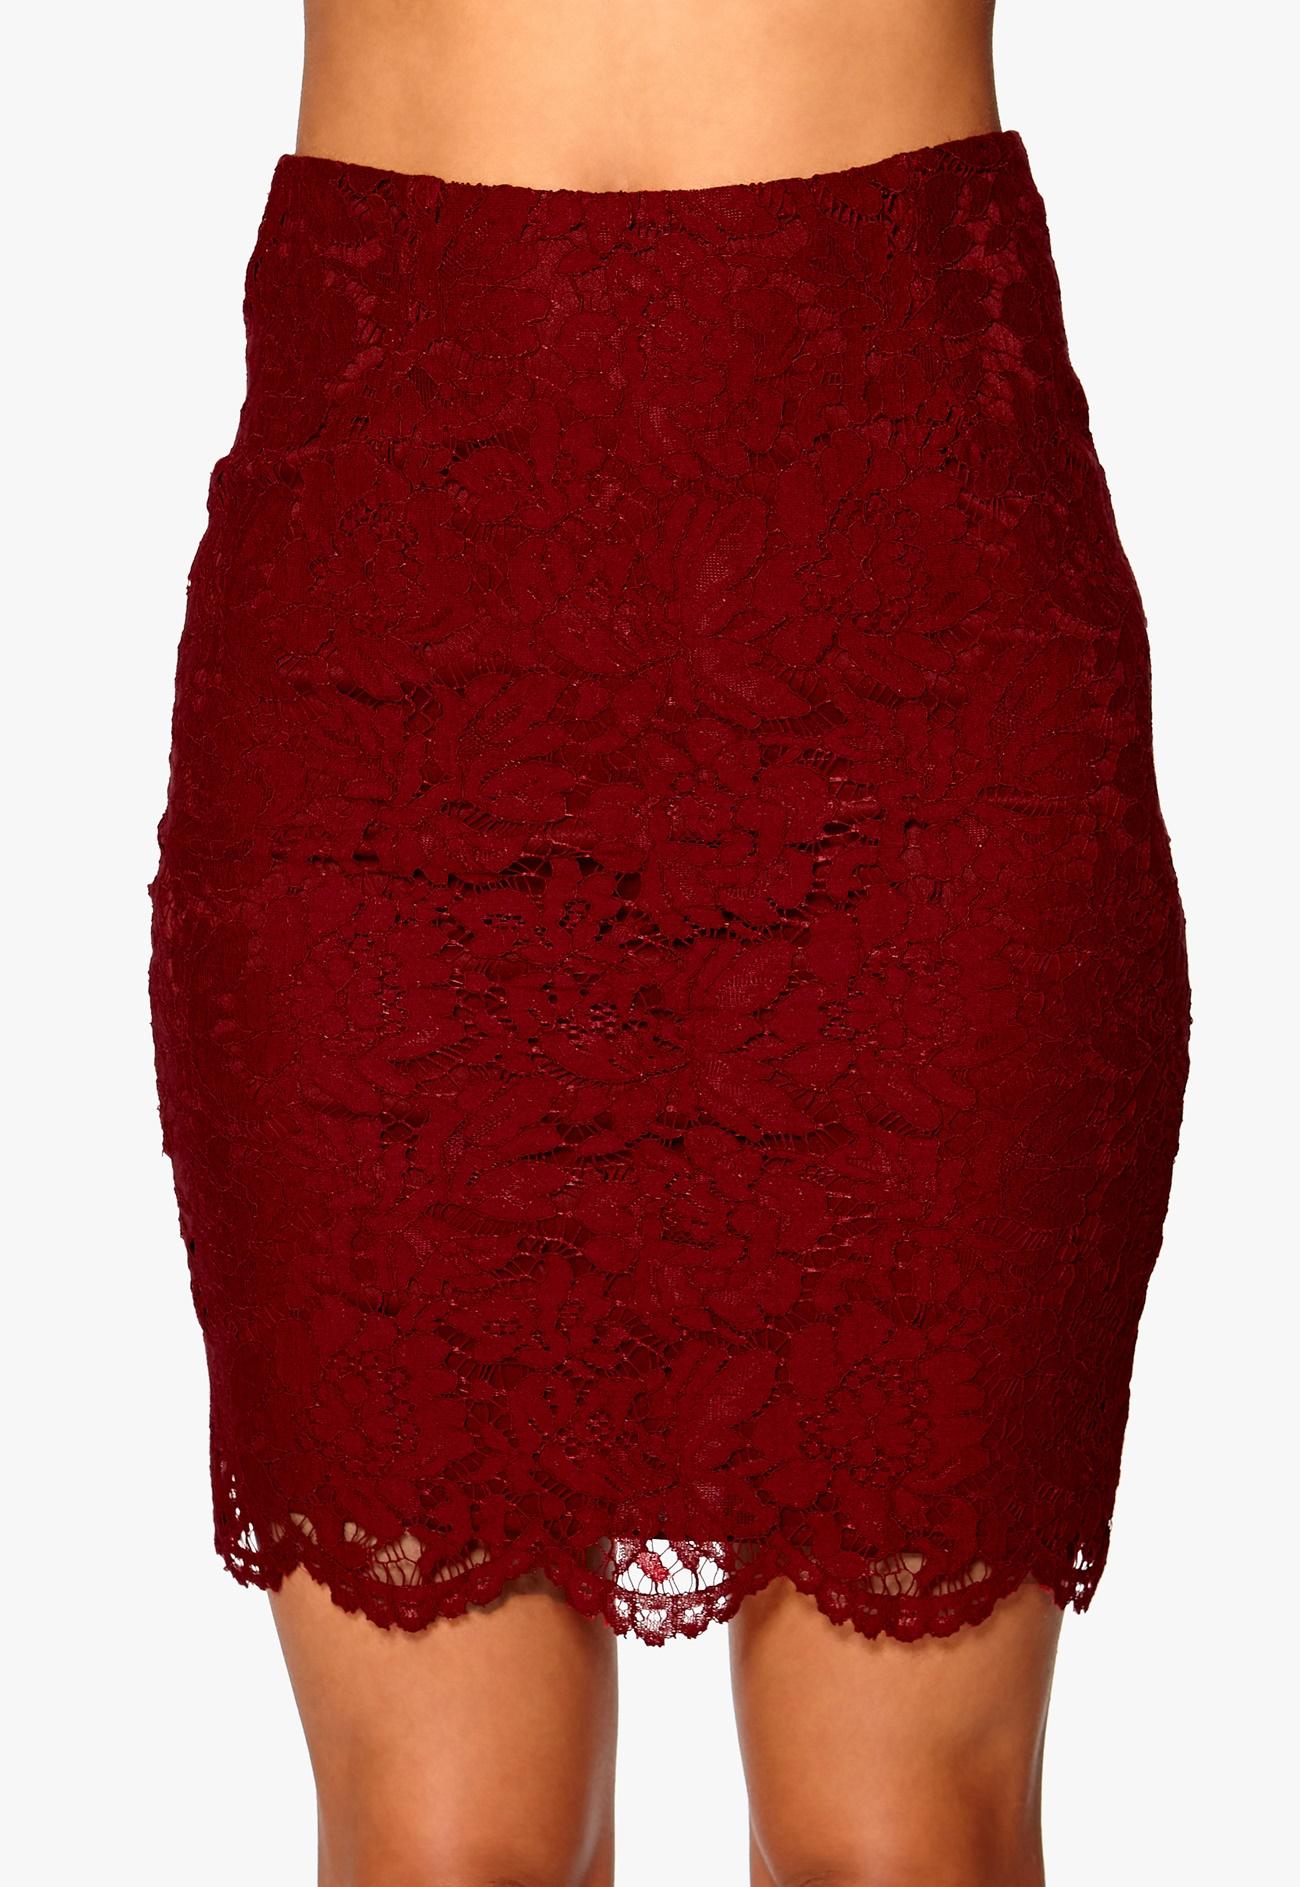 How To Make More Room On A Skirt Waist